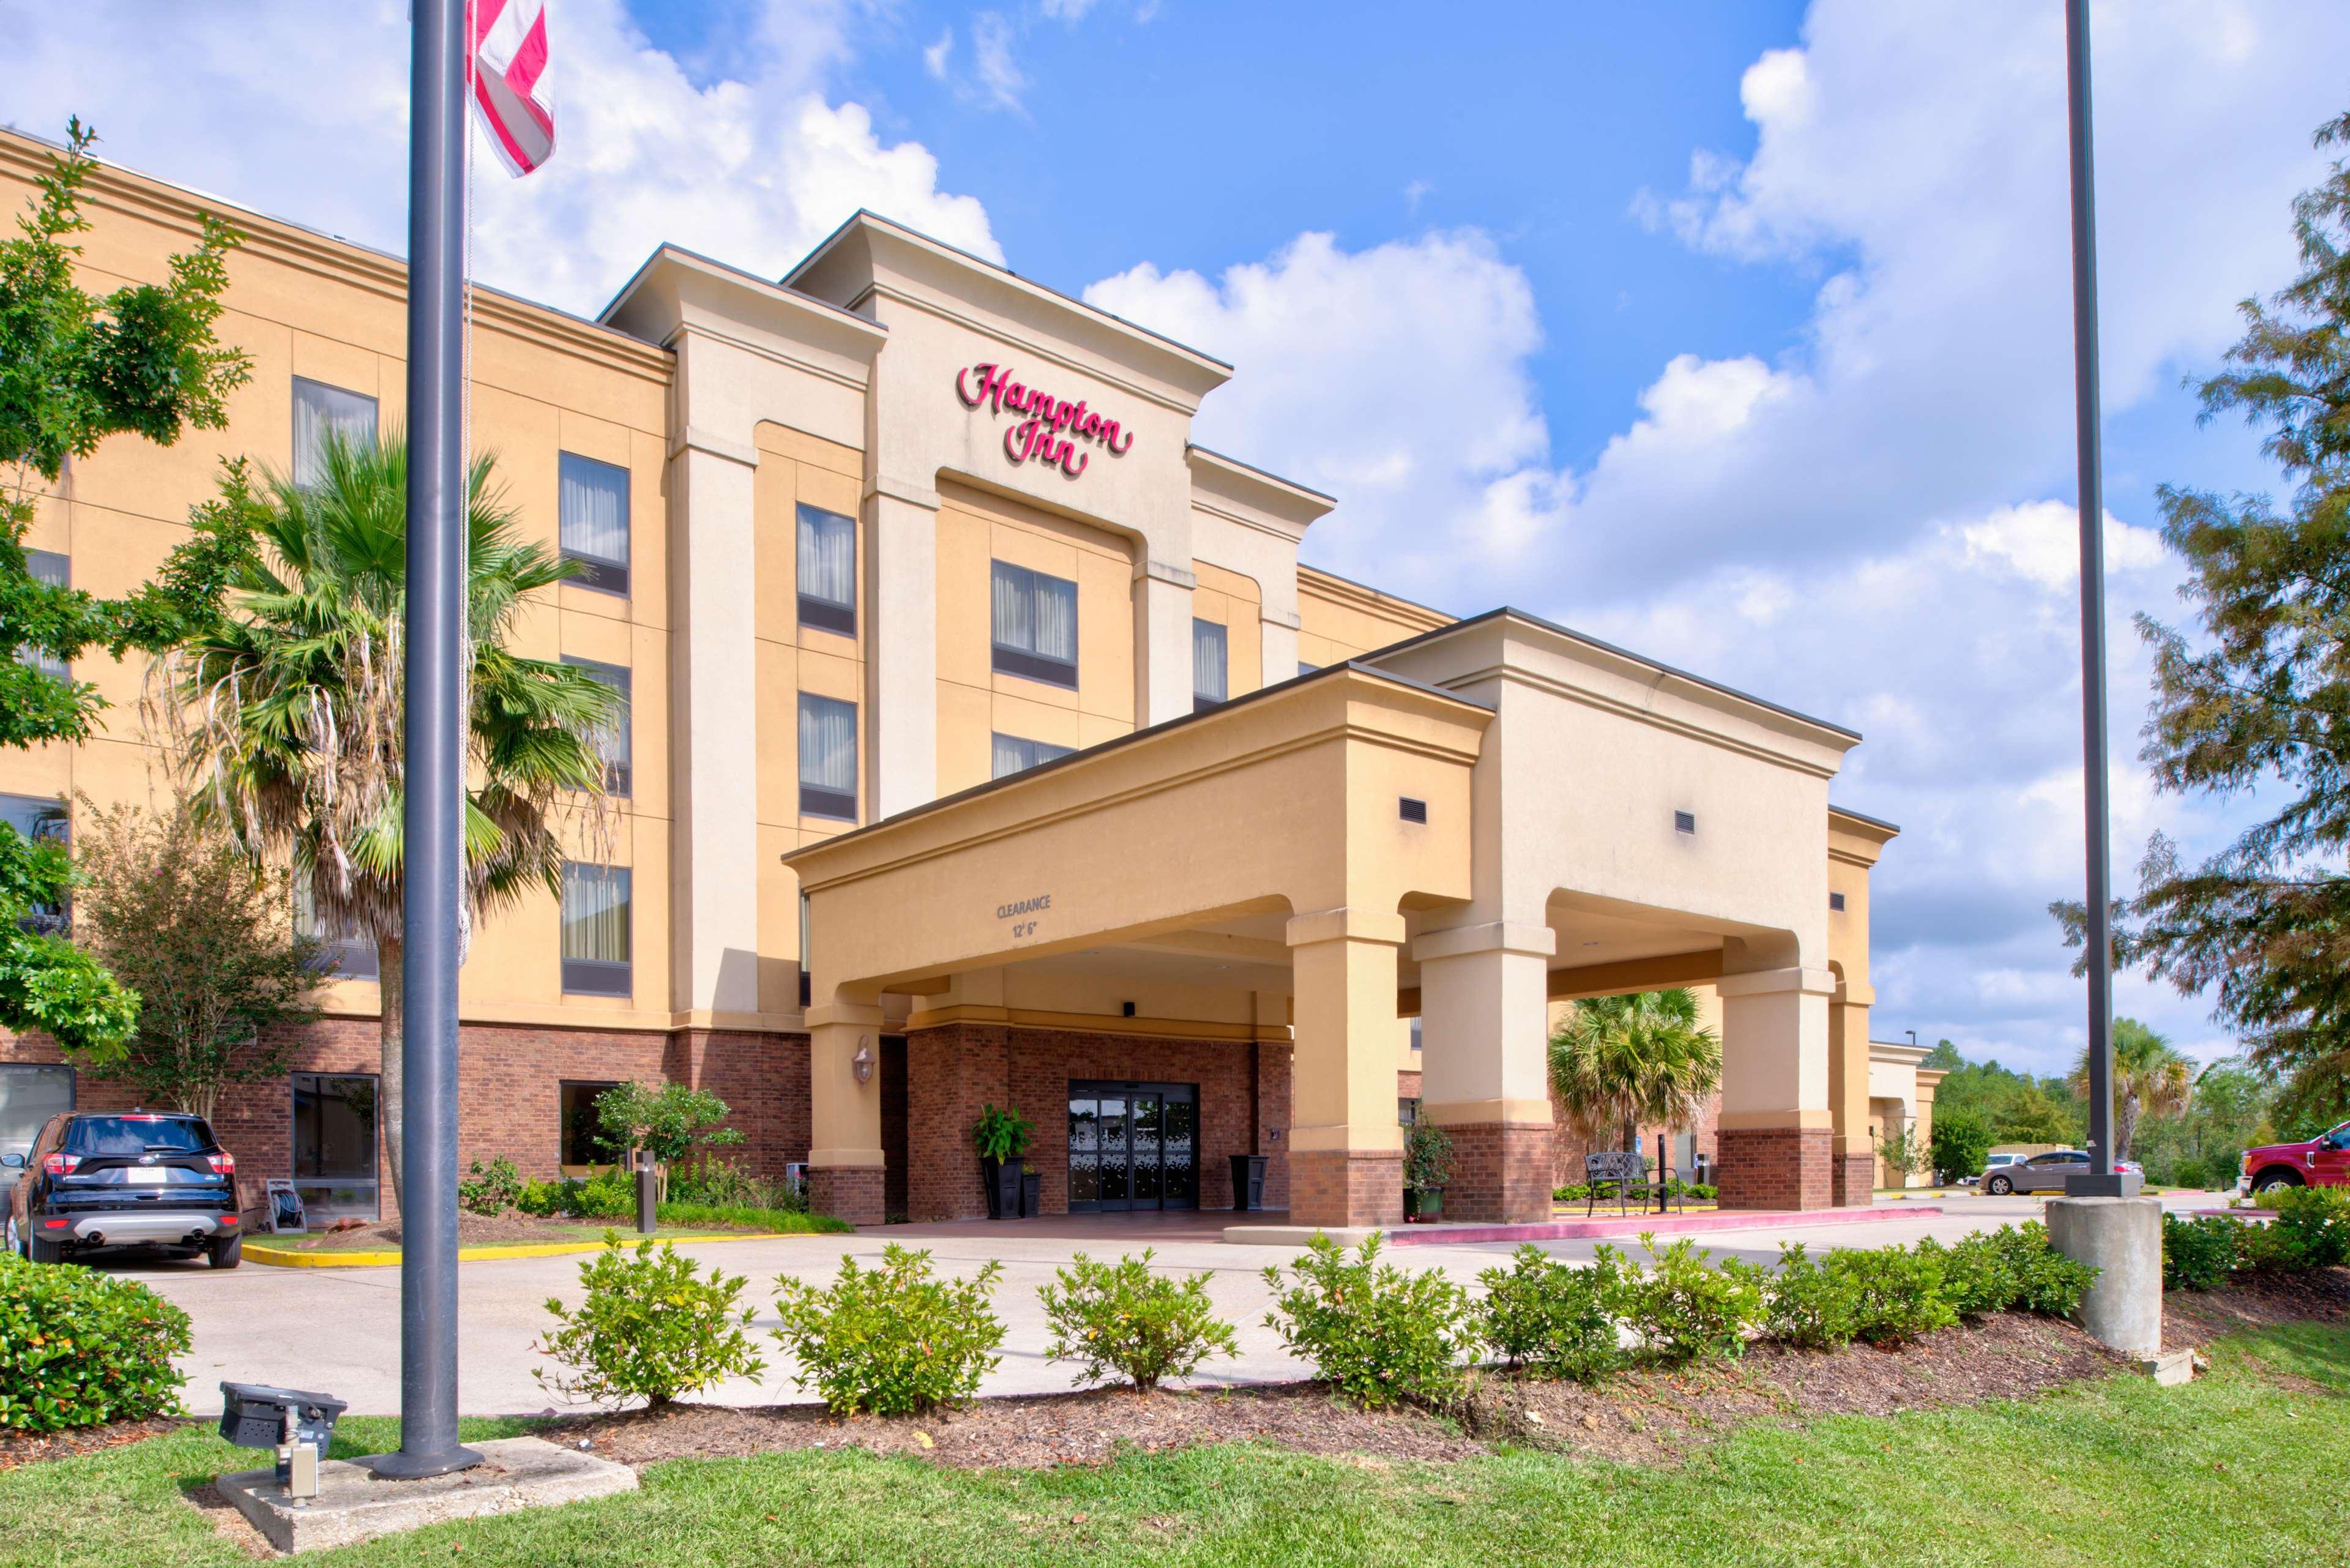 Hampton Inn Baton Rouge - Denham Springs image 2